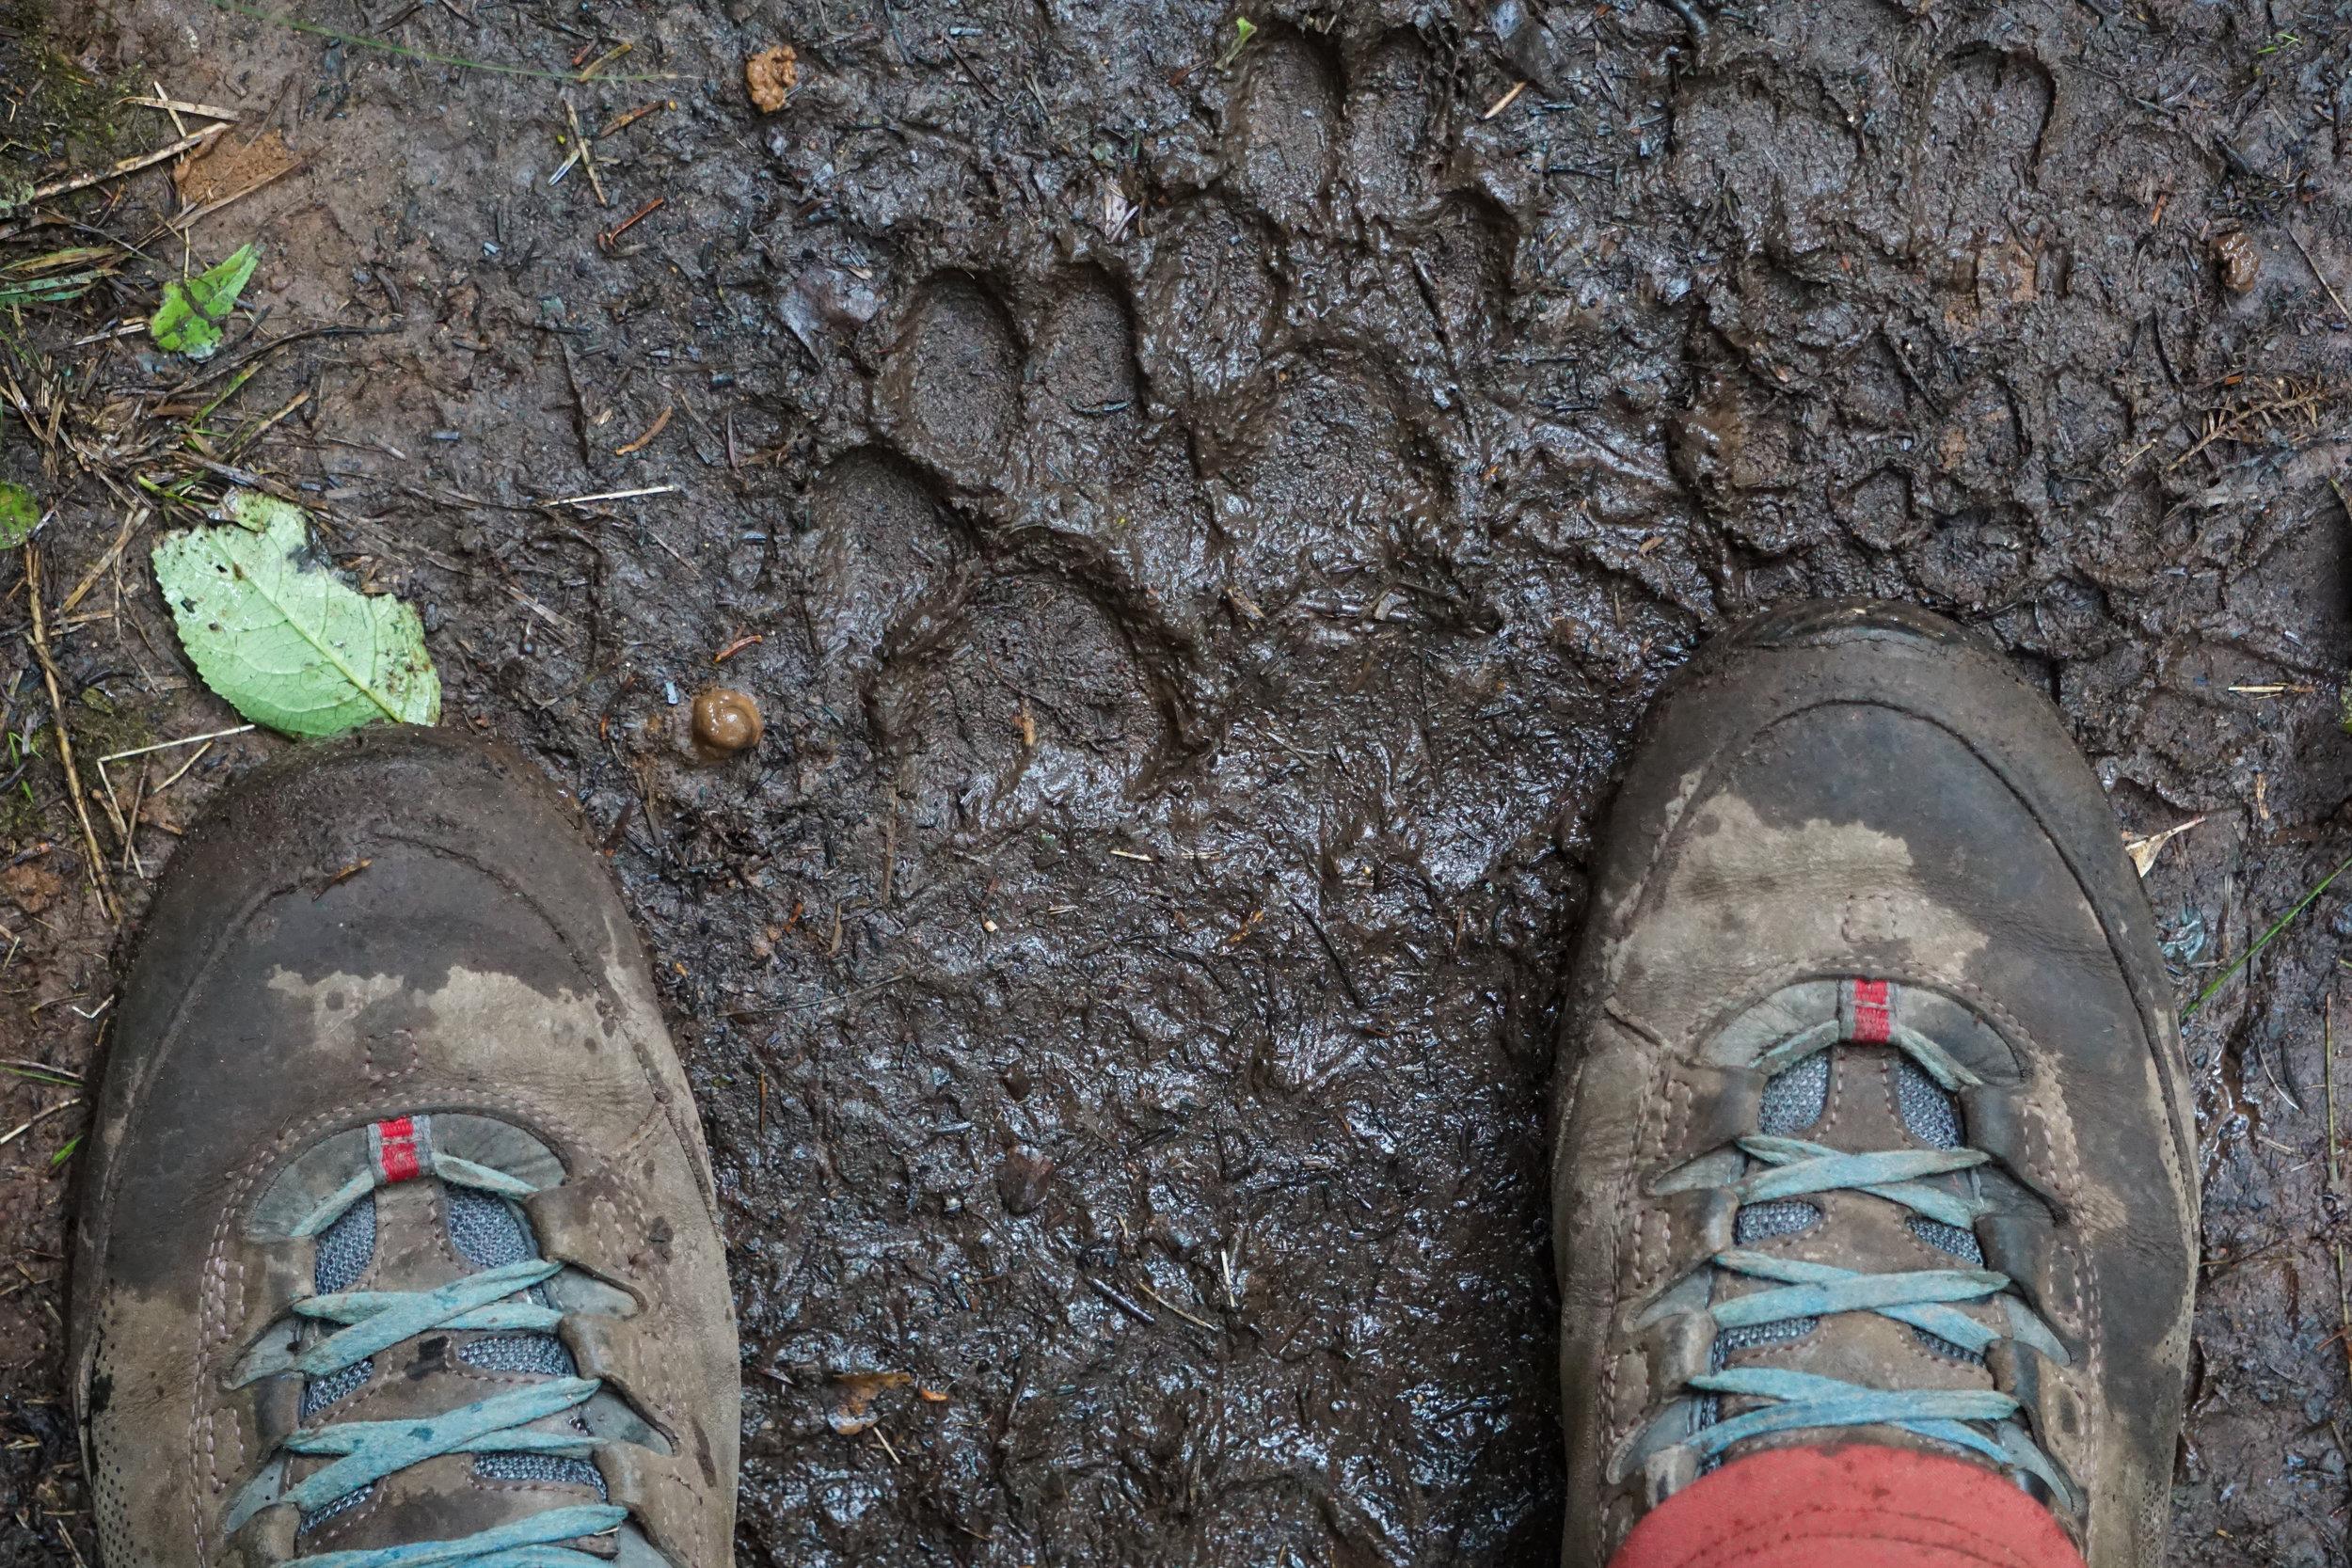 Fresh wolf prints